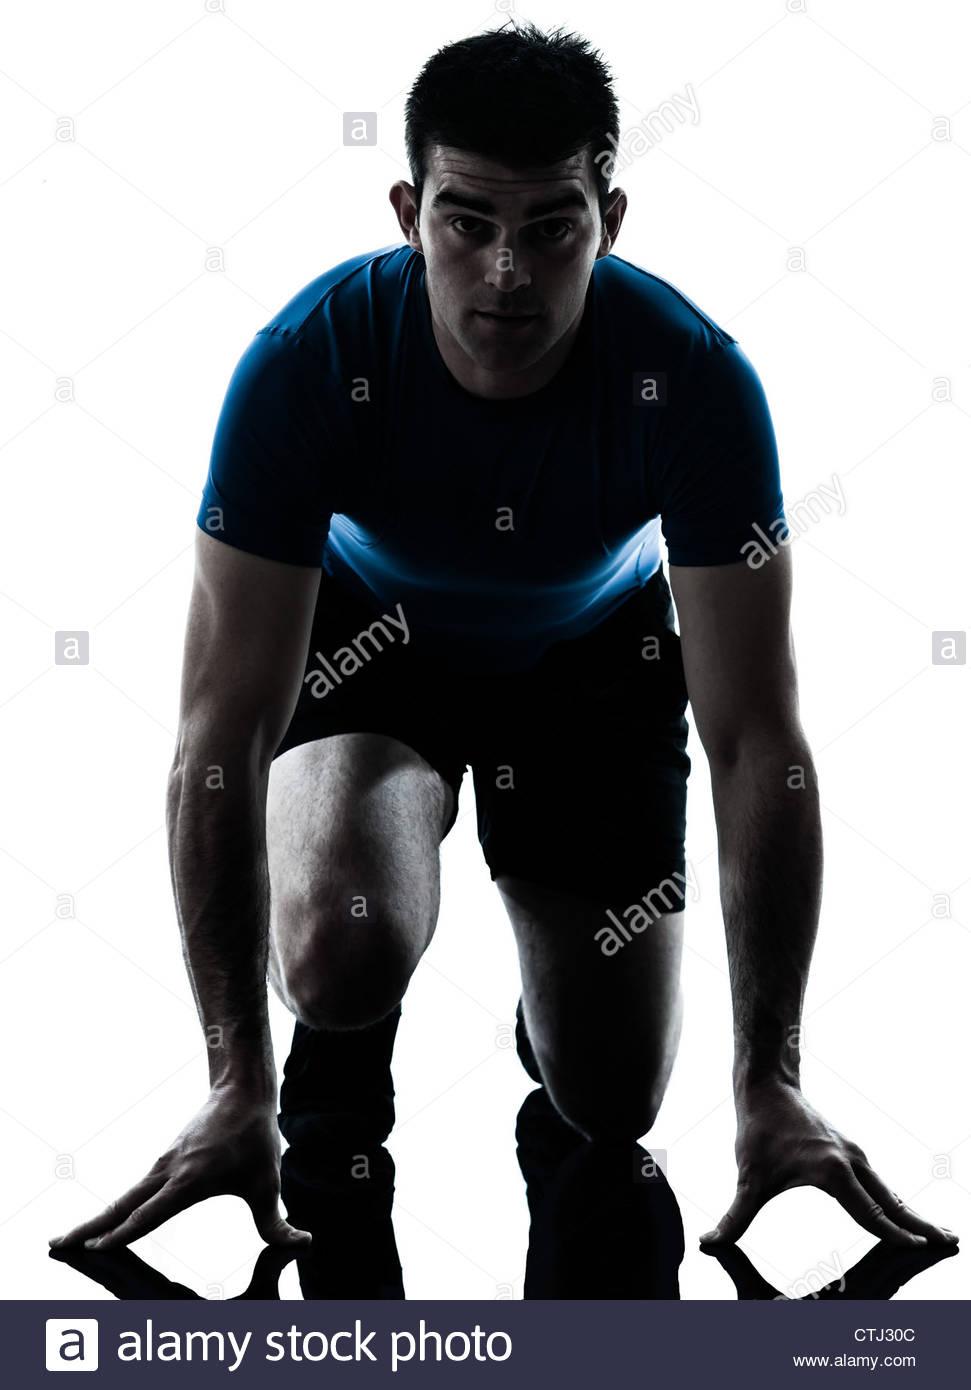 971x1390 One Caucasian Man Runner Running Sprinter Sprinting In Silhouette